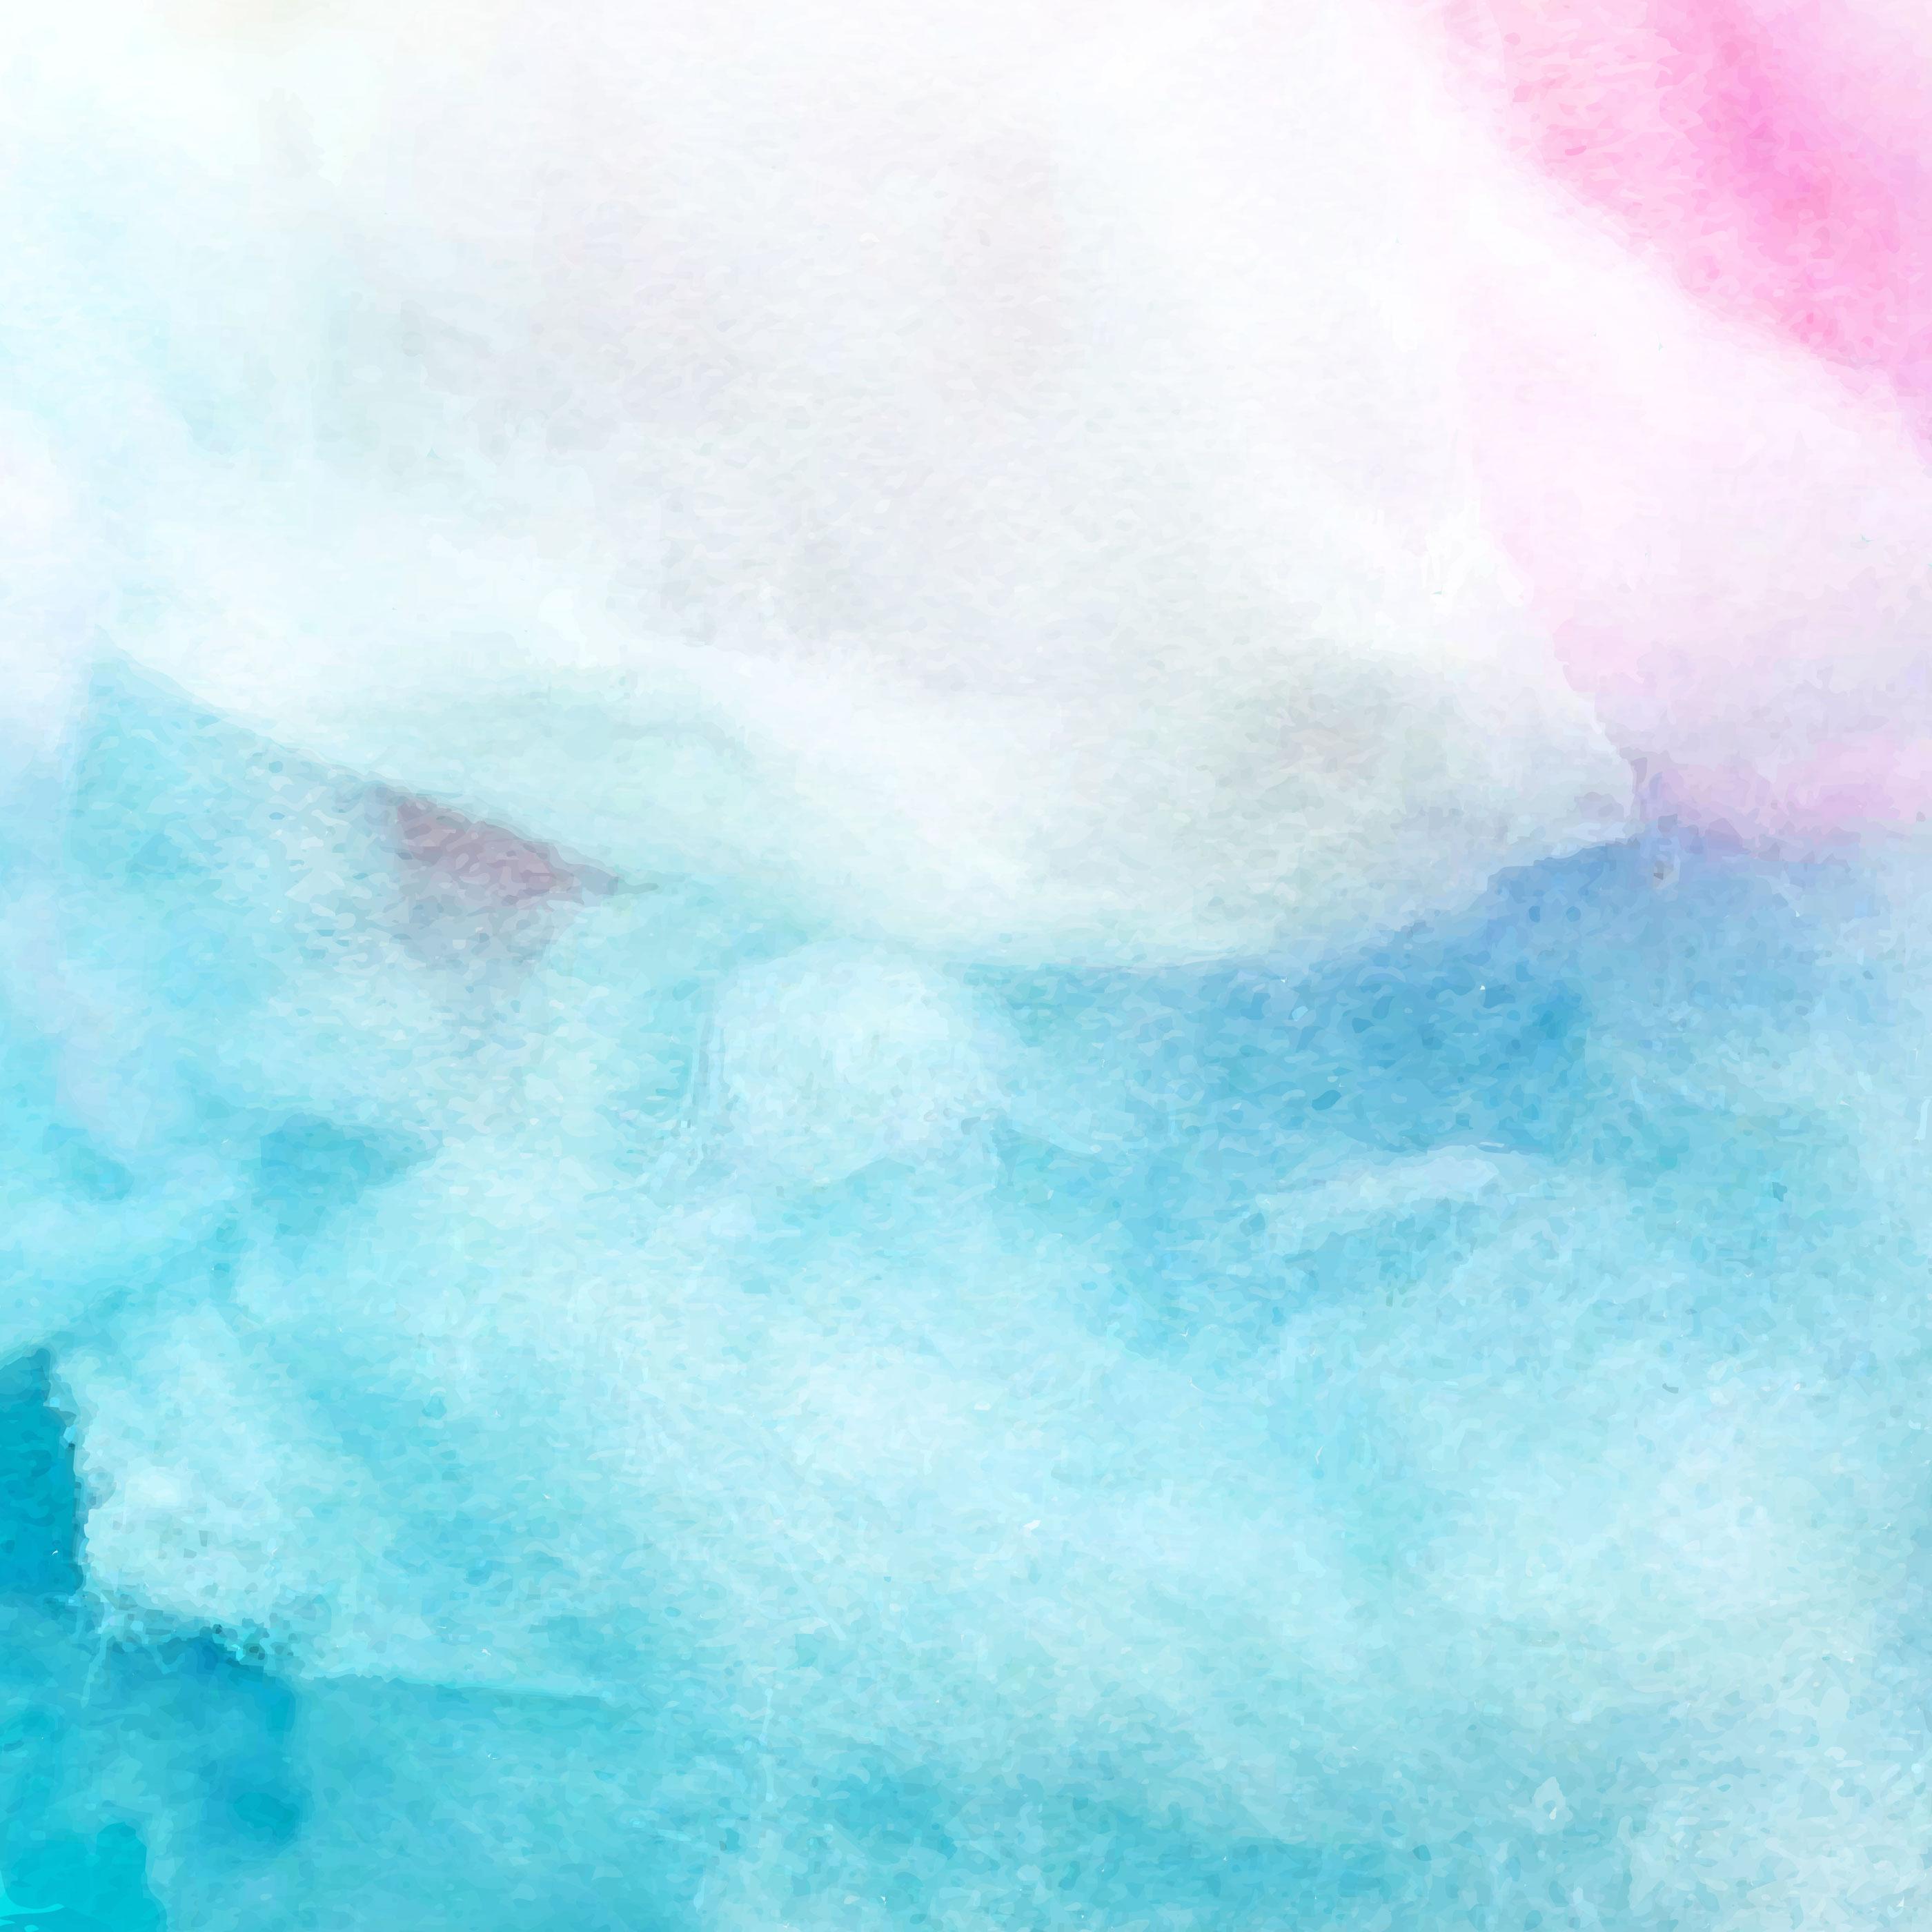 Pastel Watercolor Vector Background Download Free Vectors Clipart Graphics Vector Art